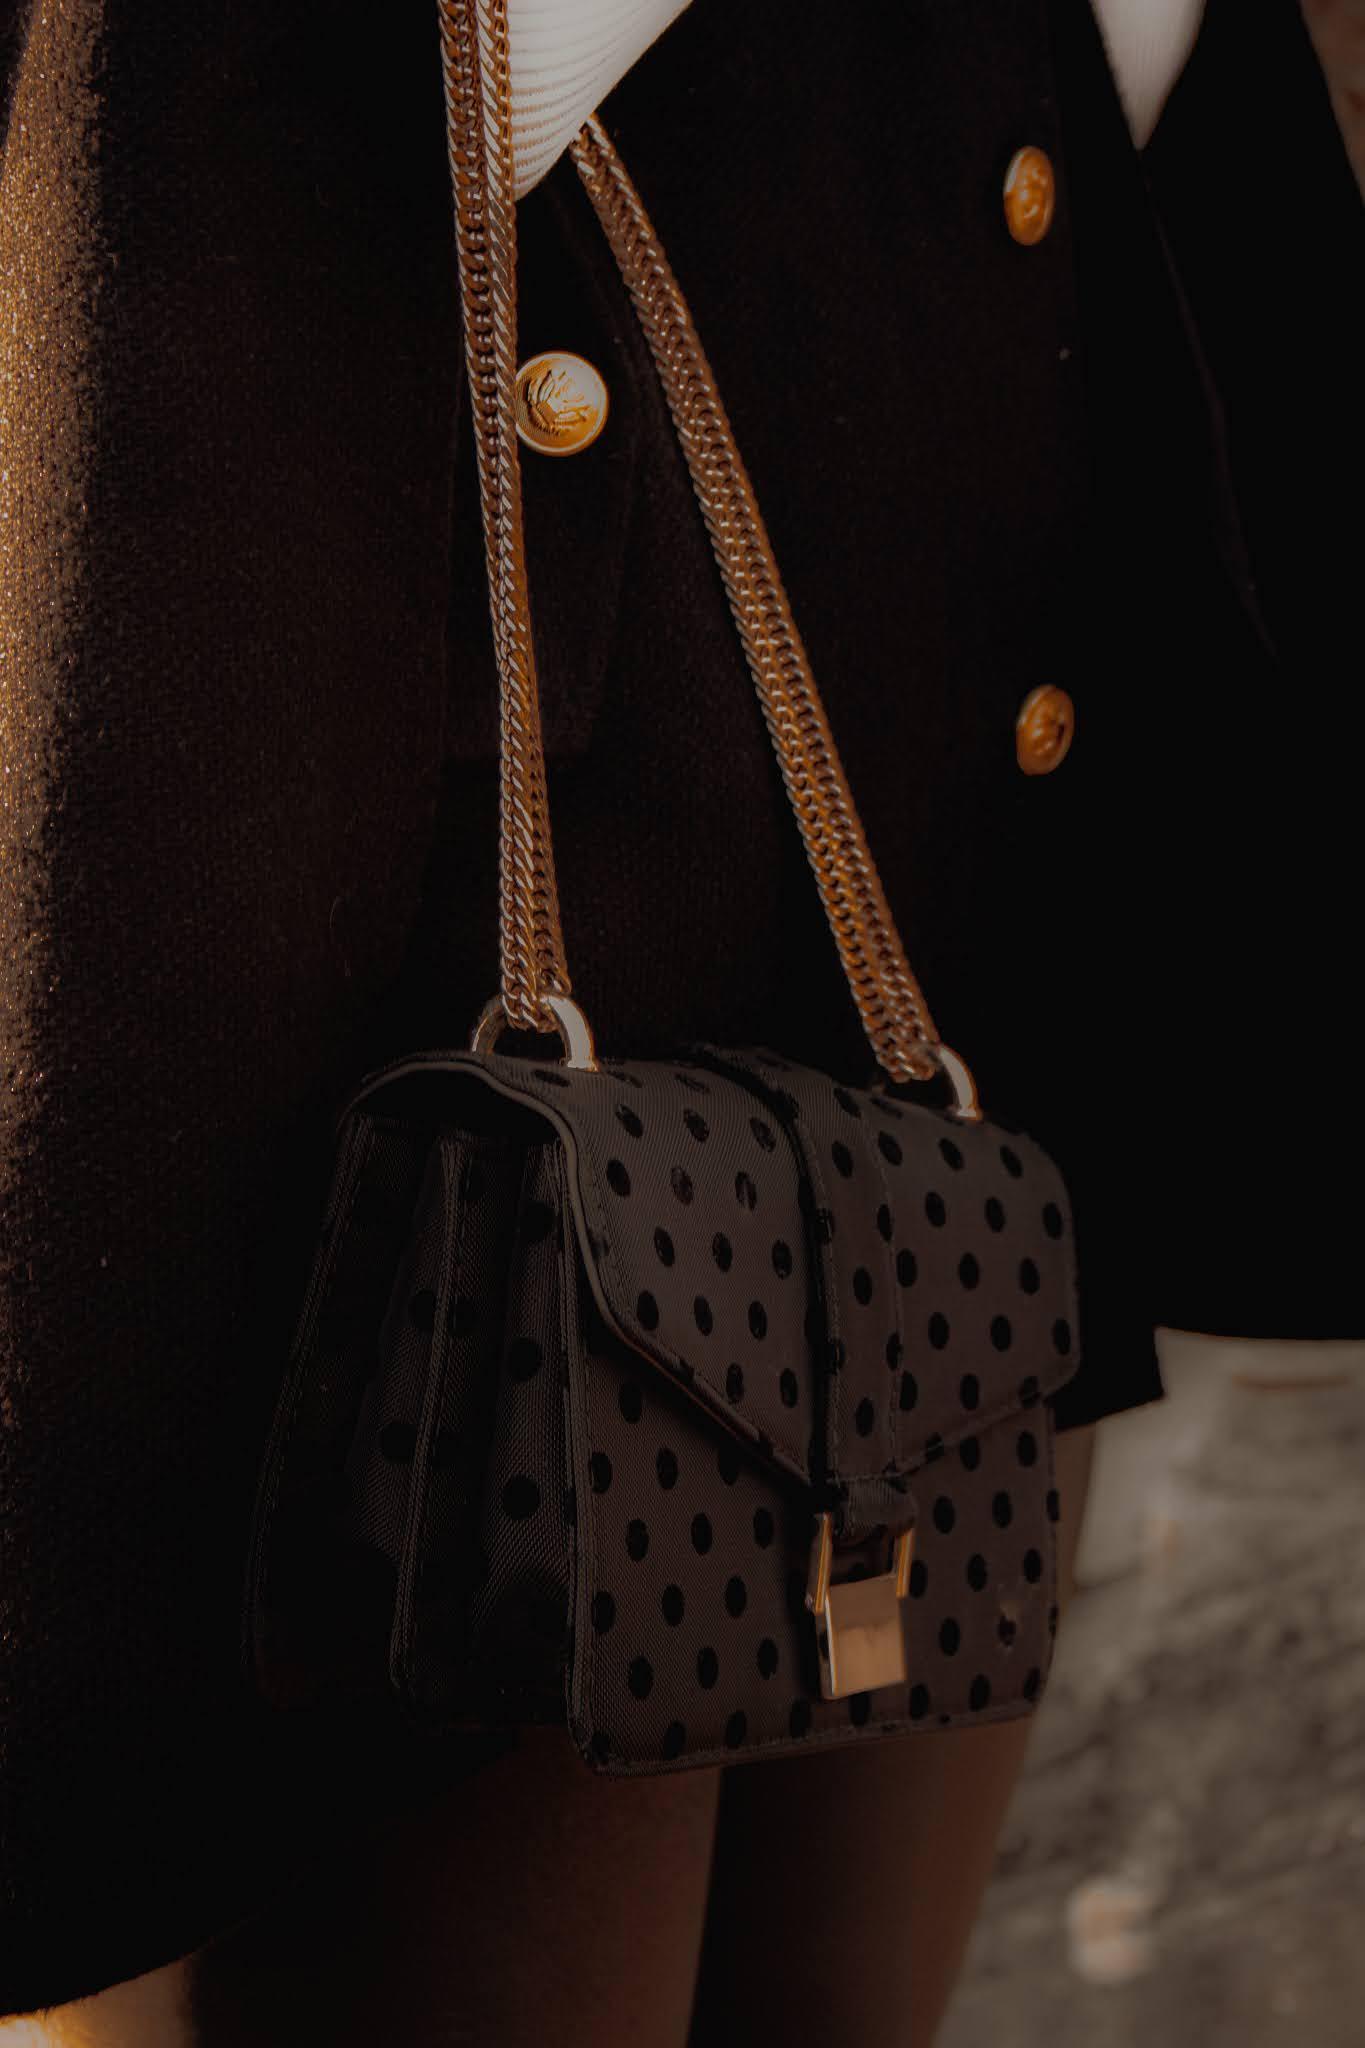 Zara black polka dot chain bag